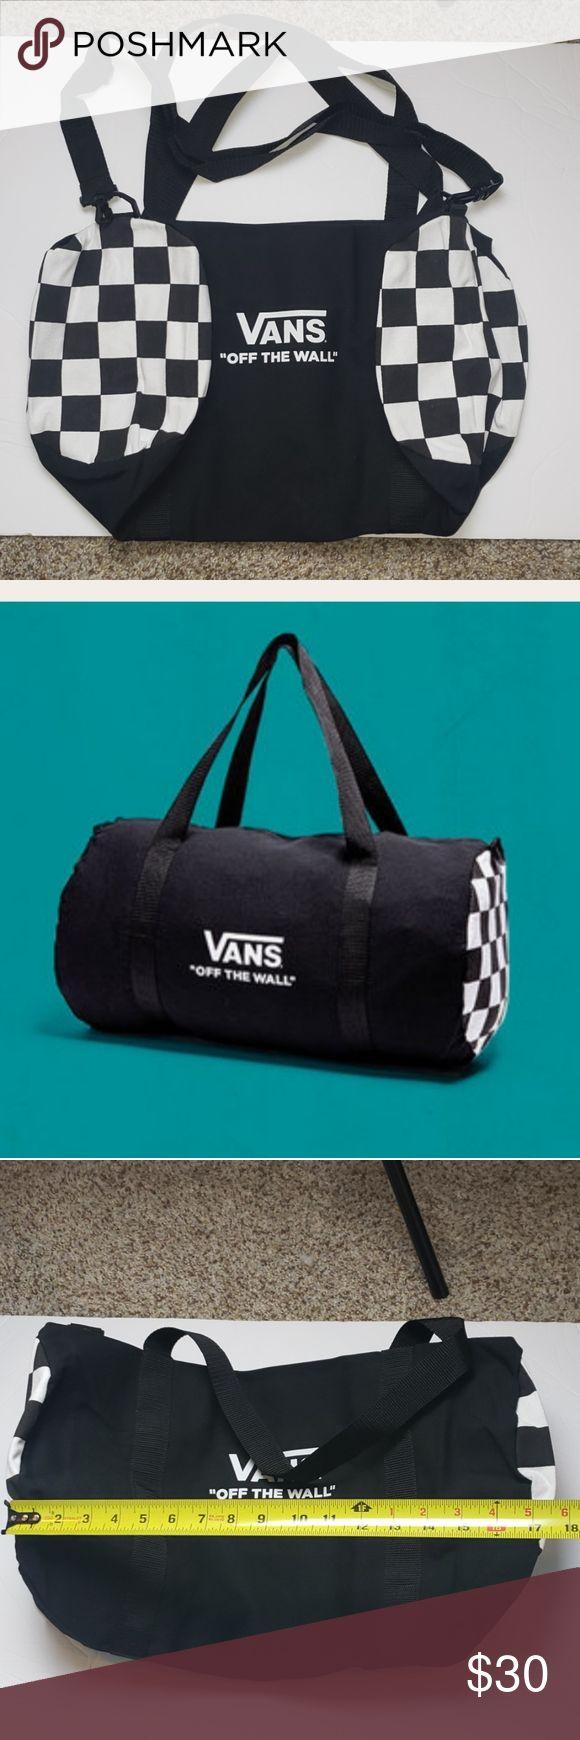 ⬇️Vans Duffle Bag | Vans bags, Duffle bag, Bags